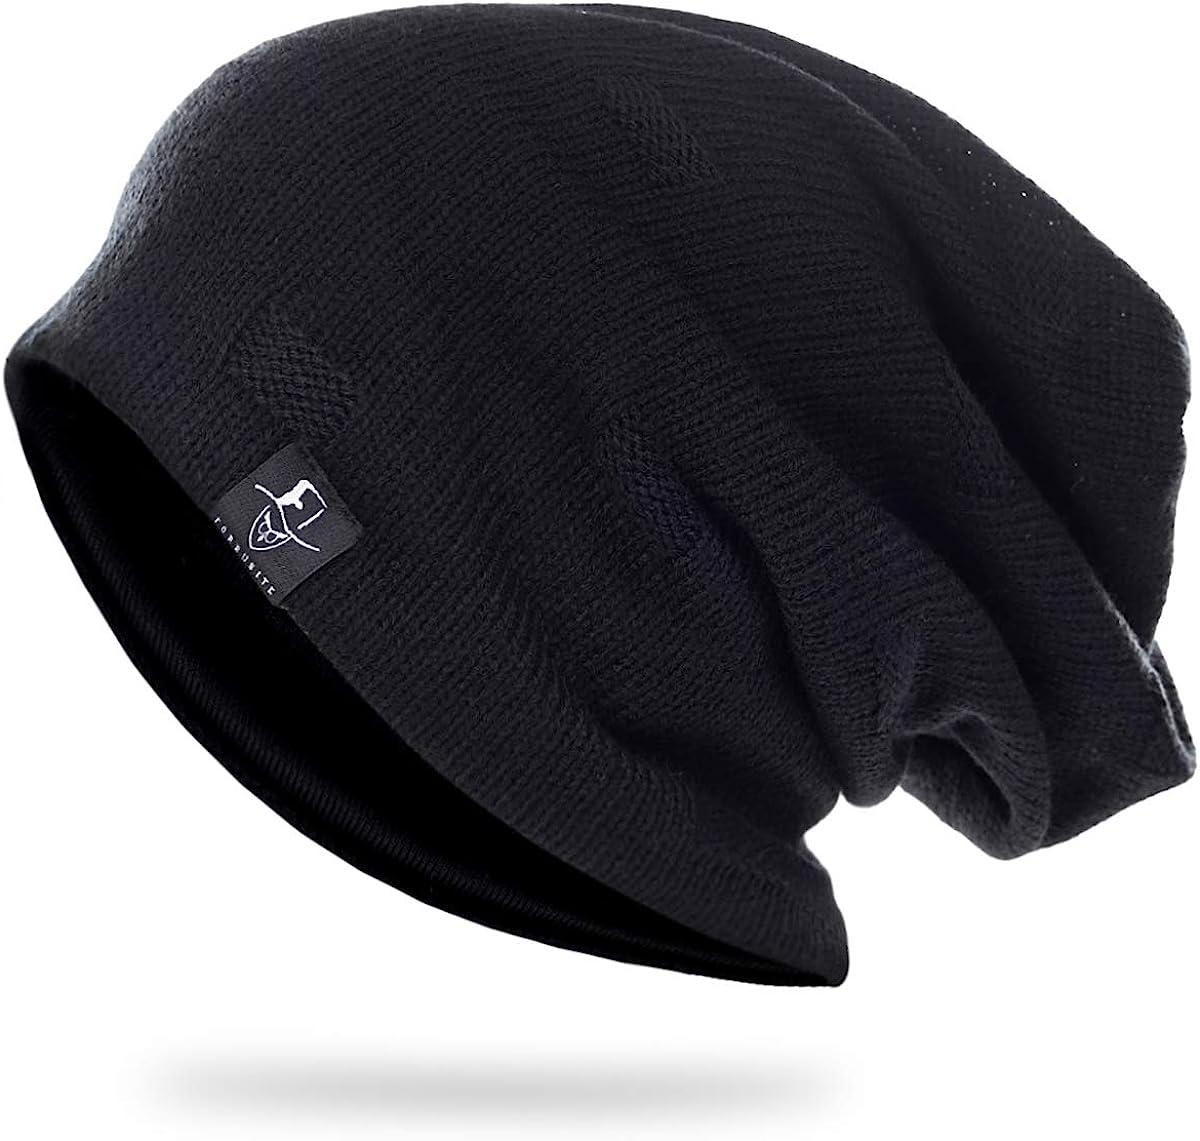 SHADIAO Mens Baggy Beanie Slouchy Oversized Beanie for Men//Women Summer Winter Knit Cap B754